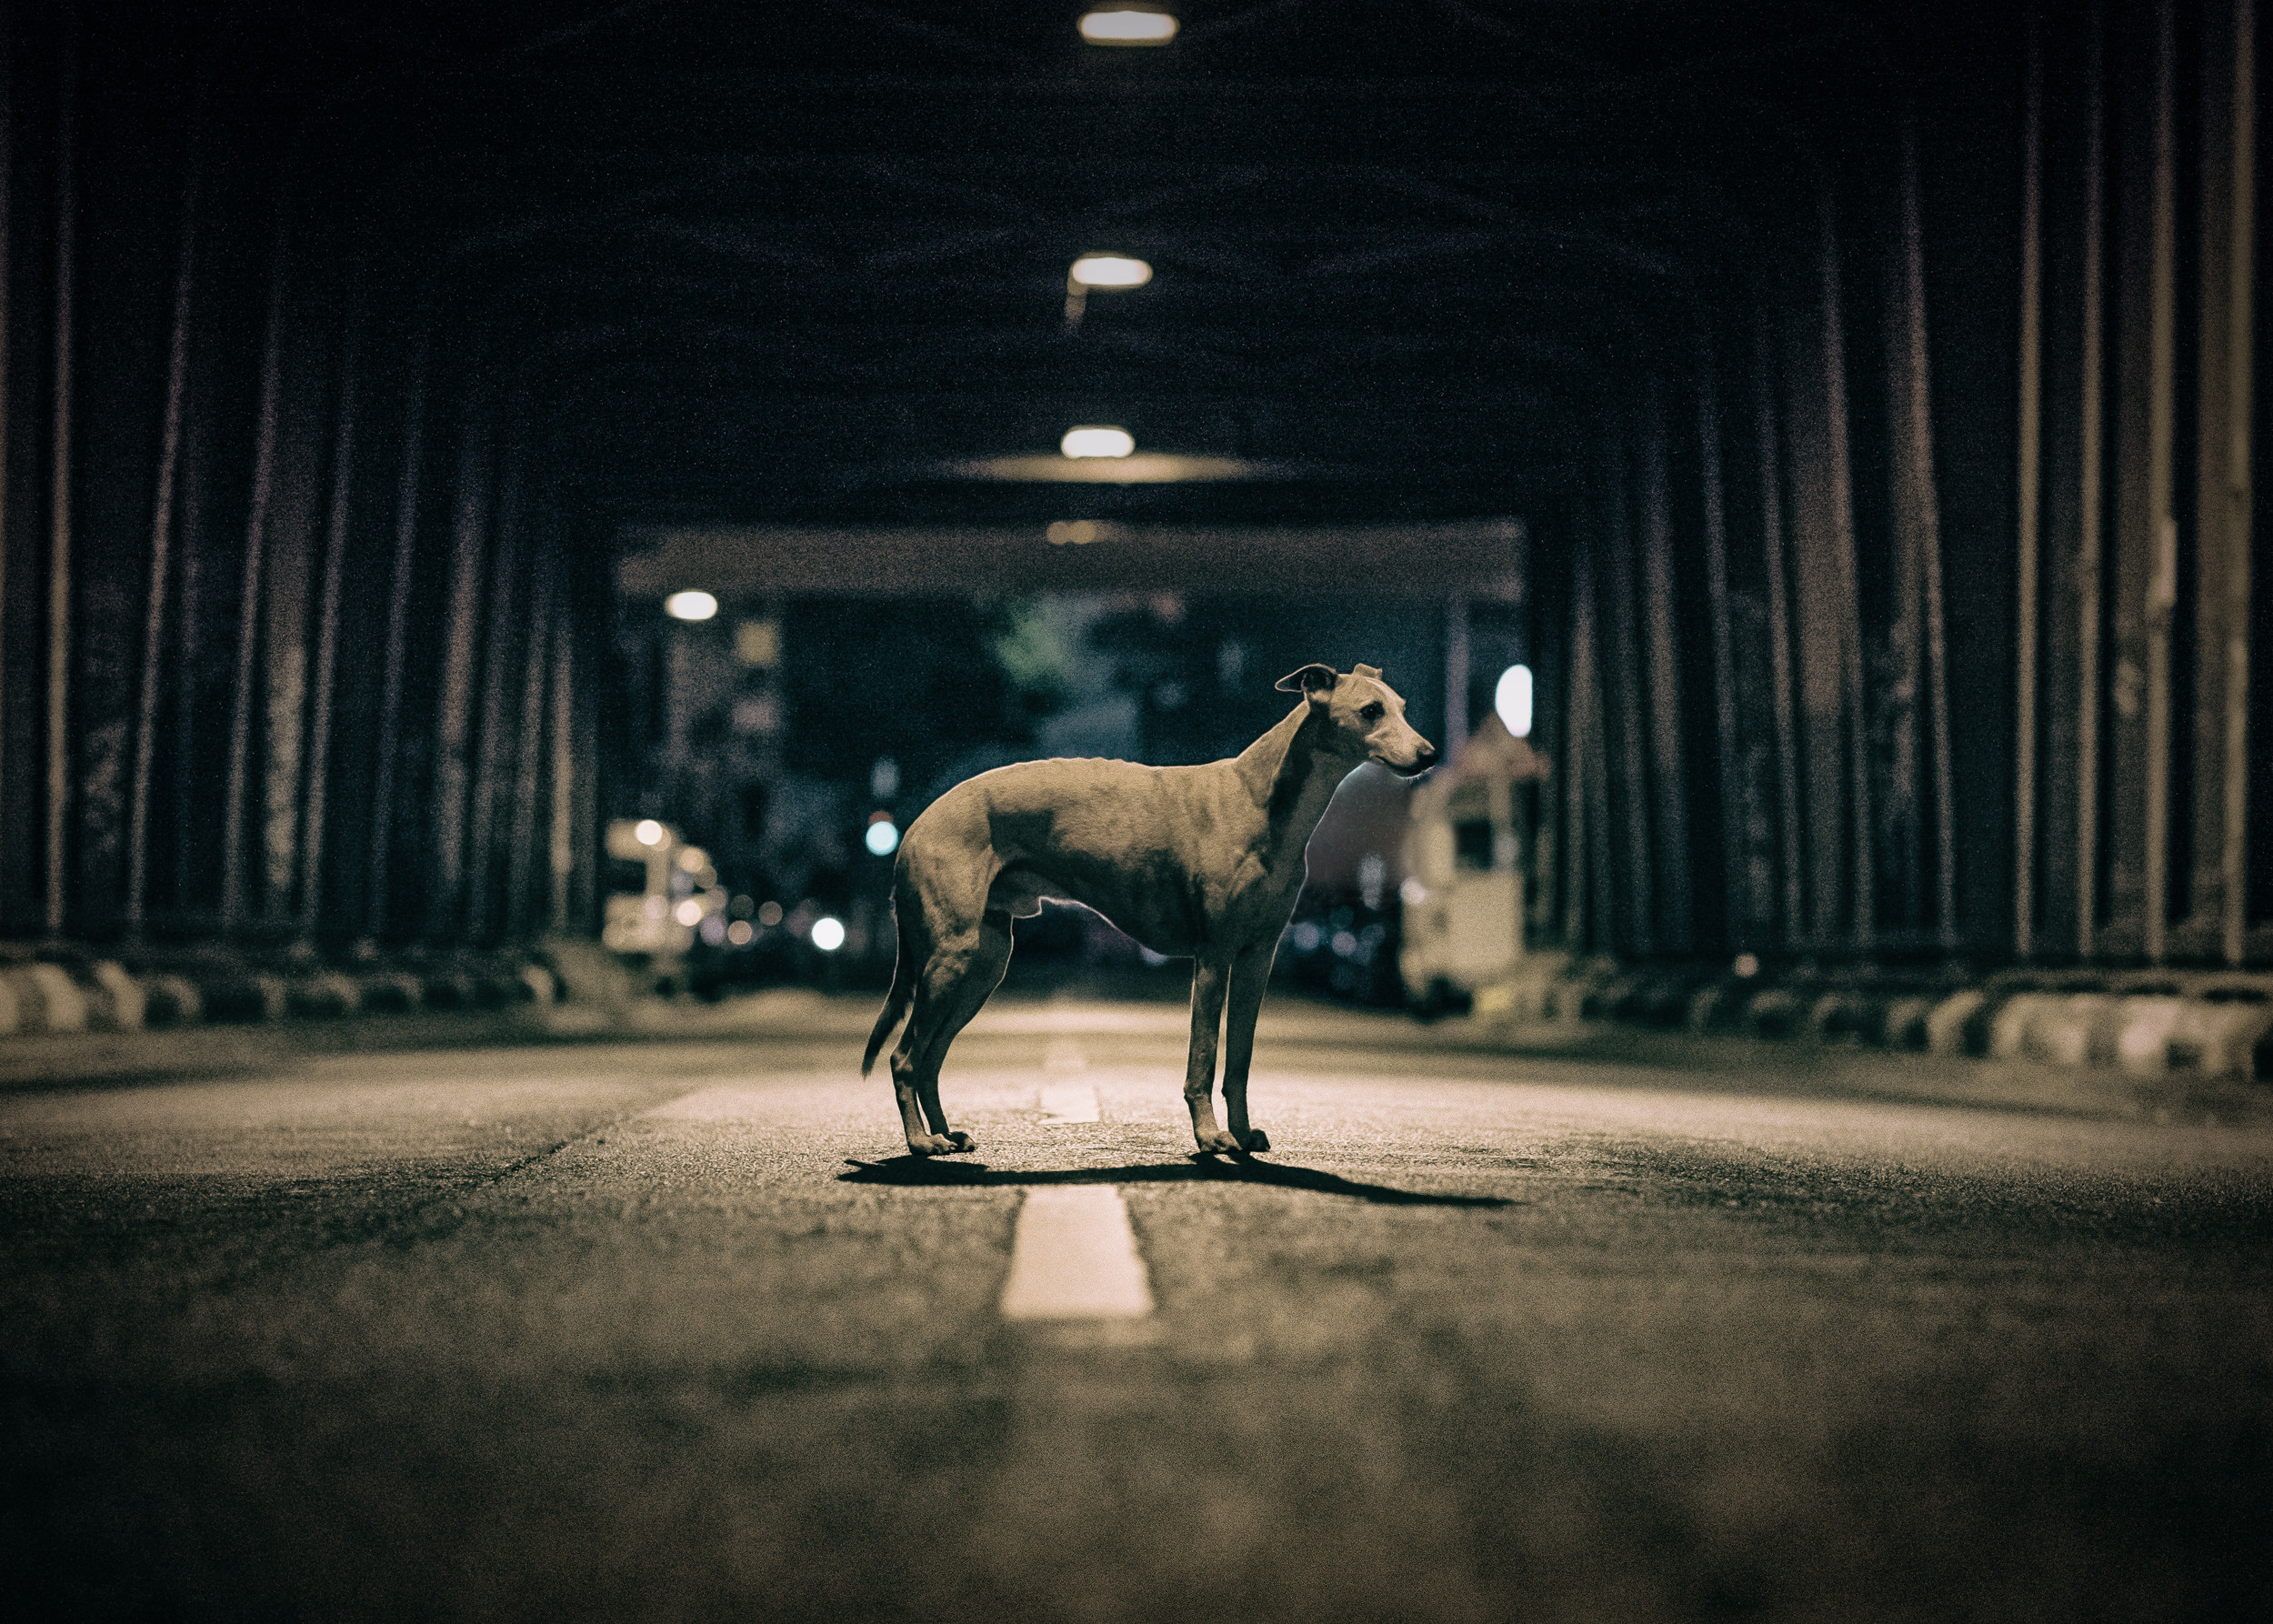 outdoor-dogs-klausdyba-15.jpg